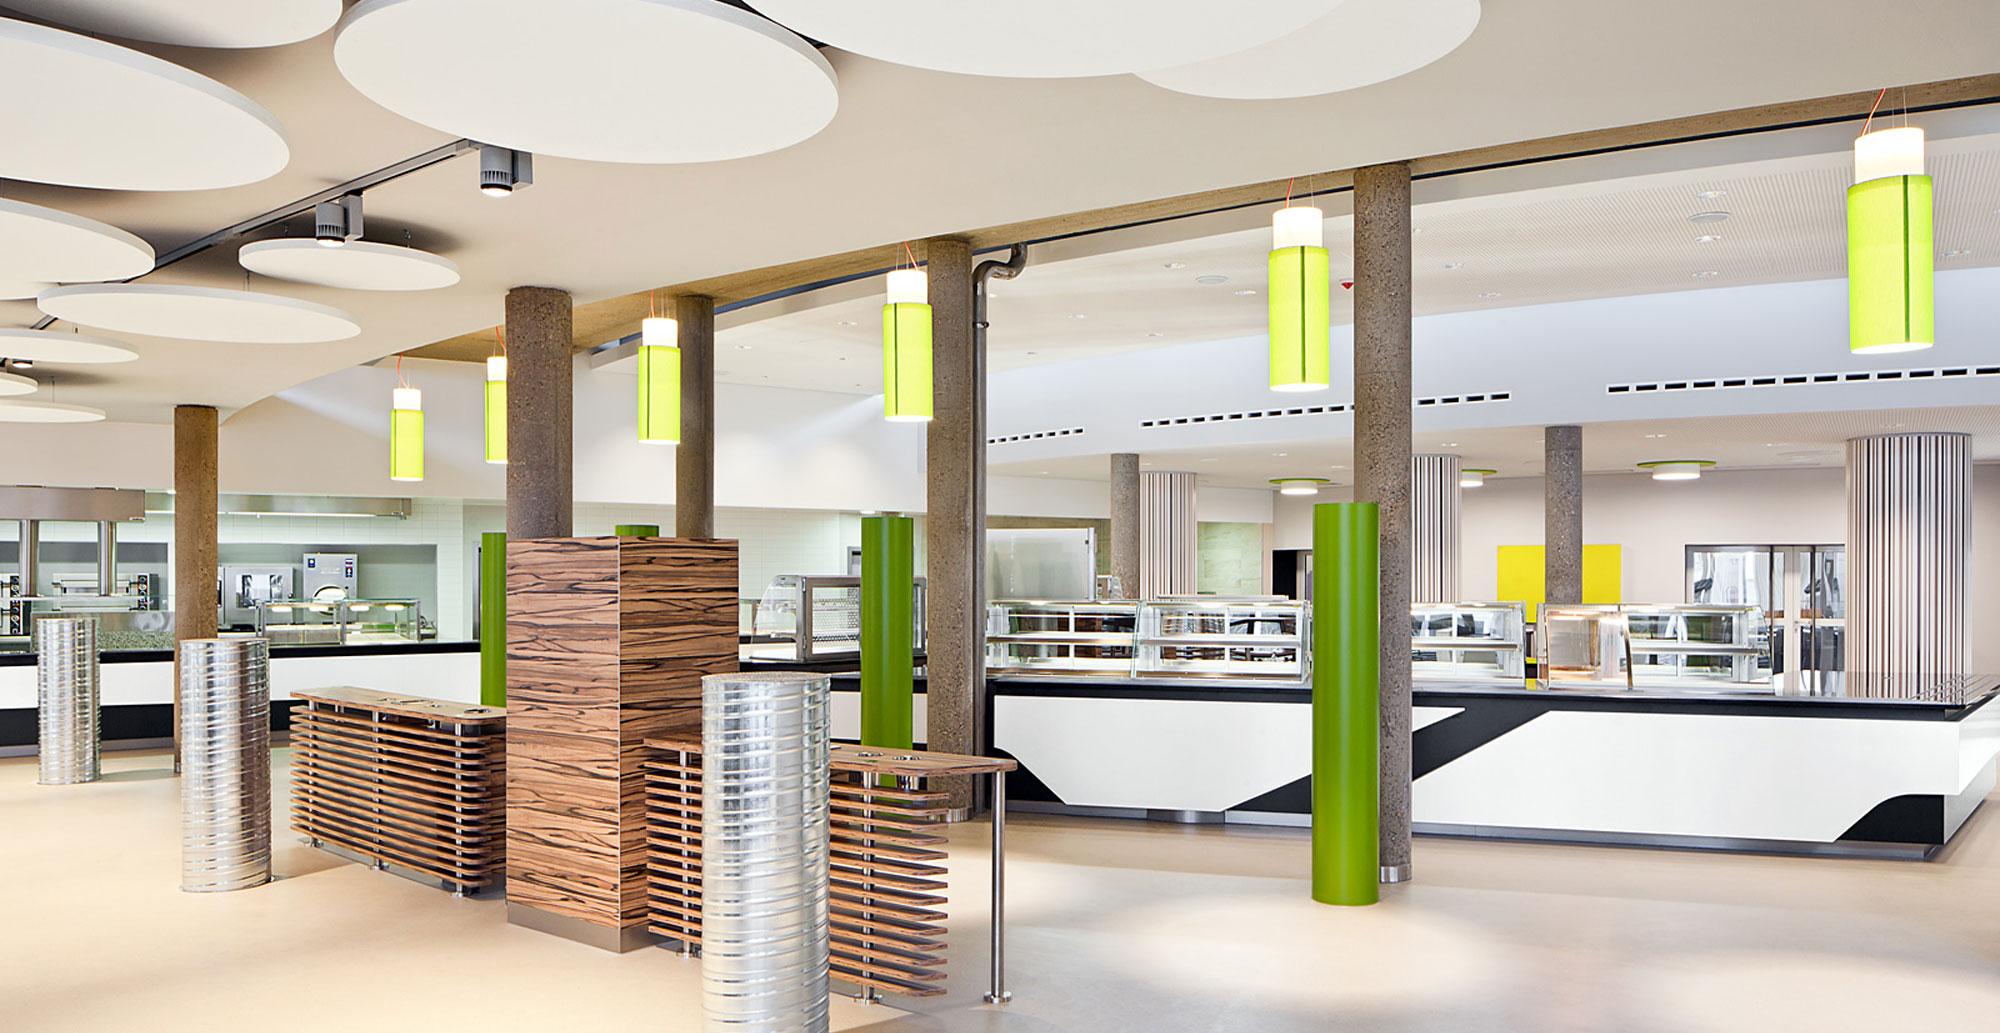 Designkonzept , Farbkonzept, BaFin Cafeteria, Bonn